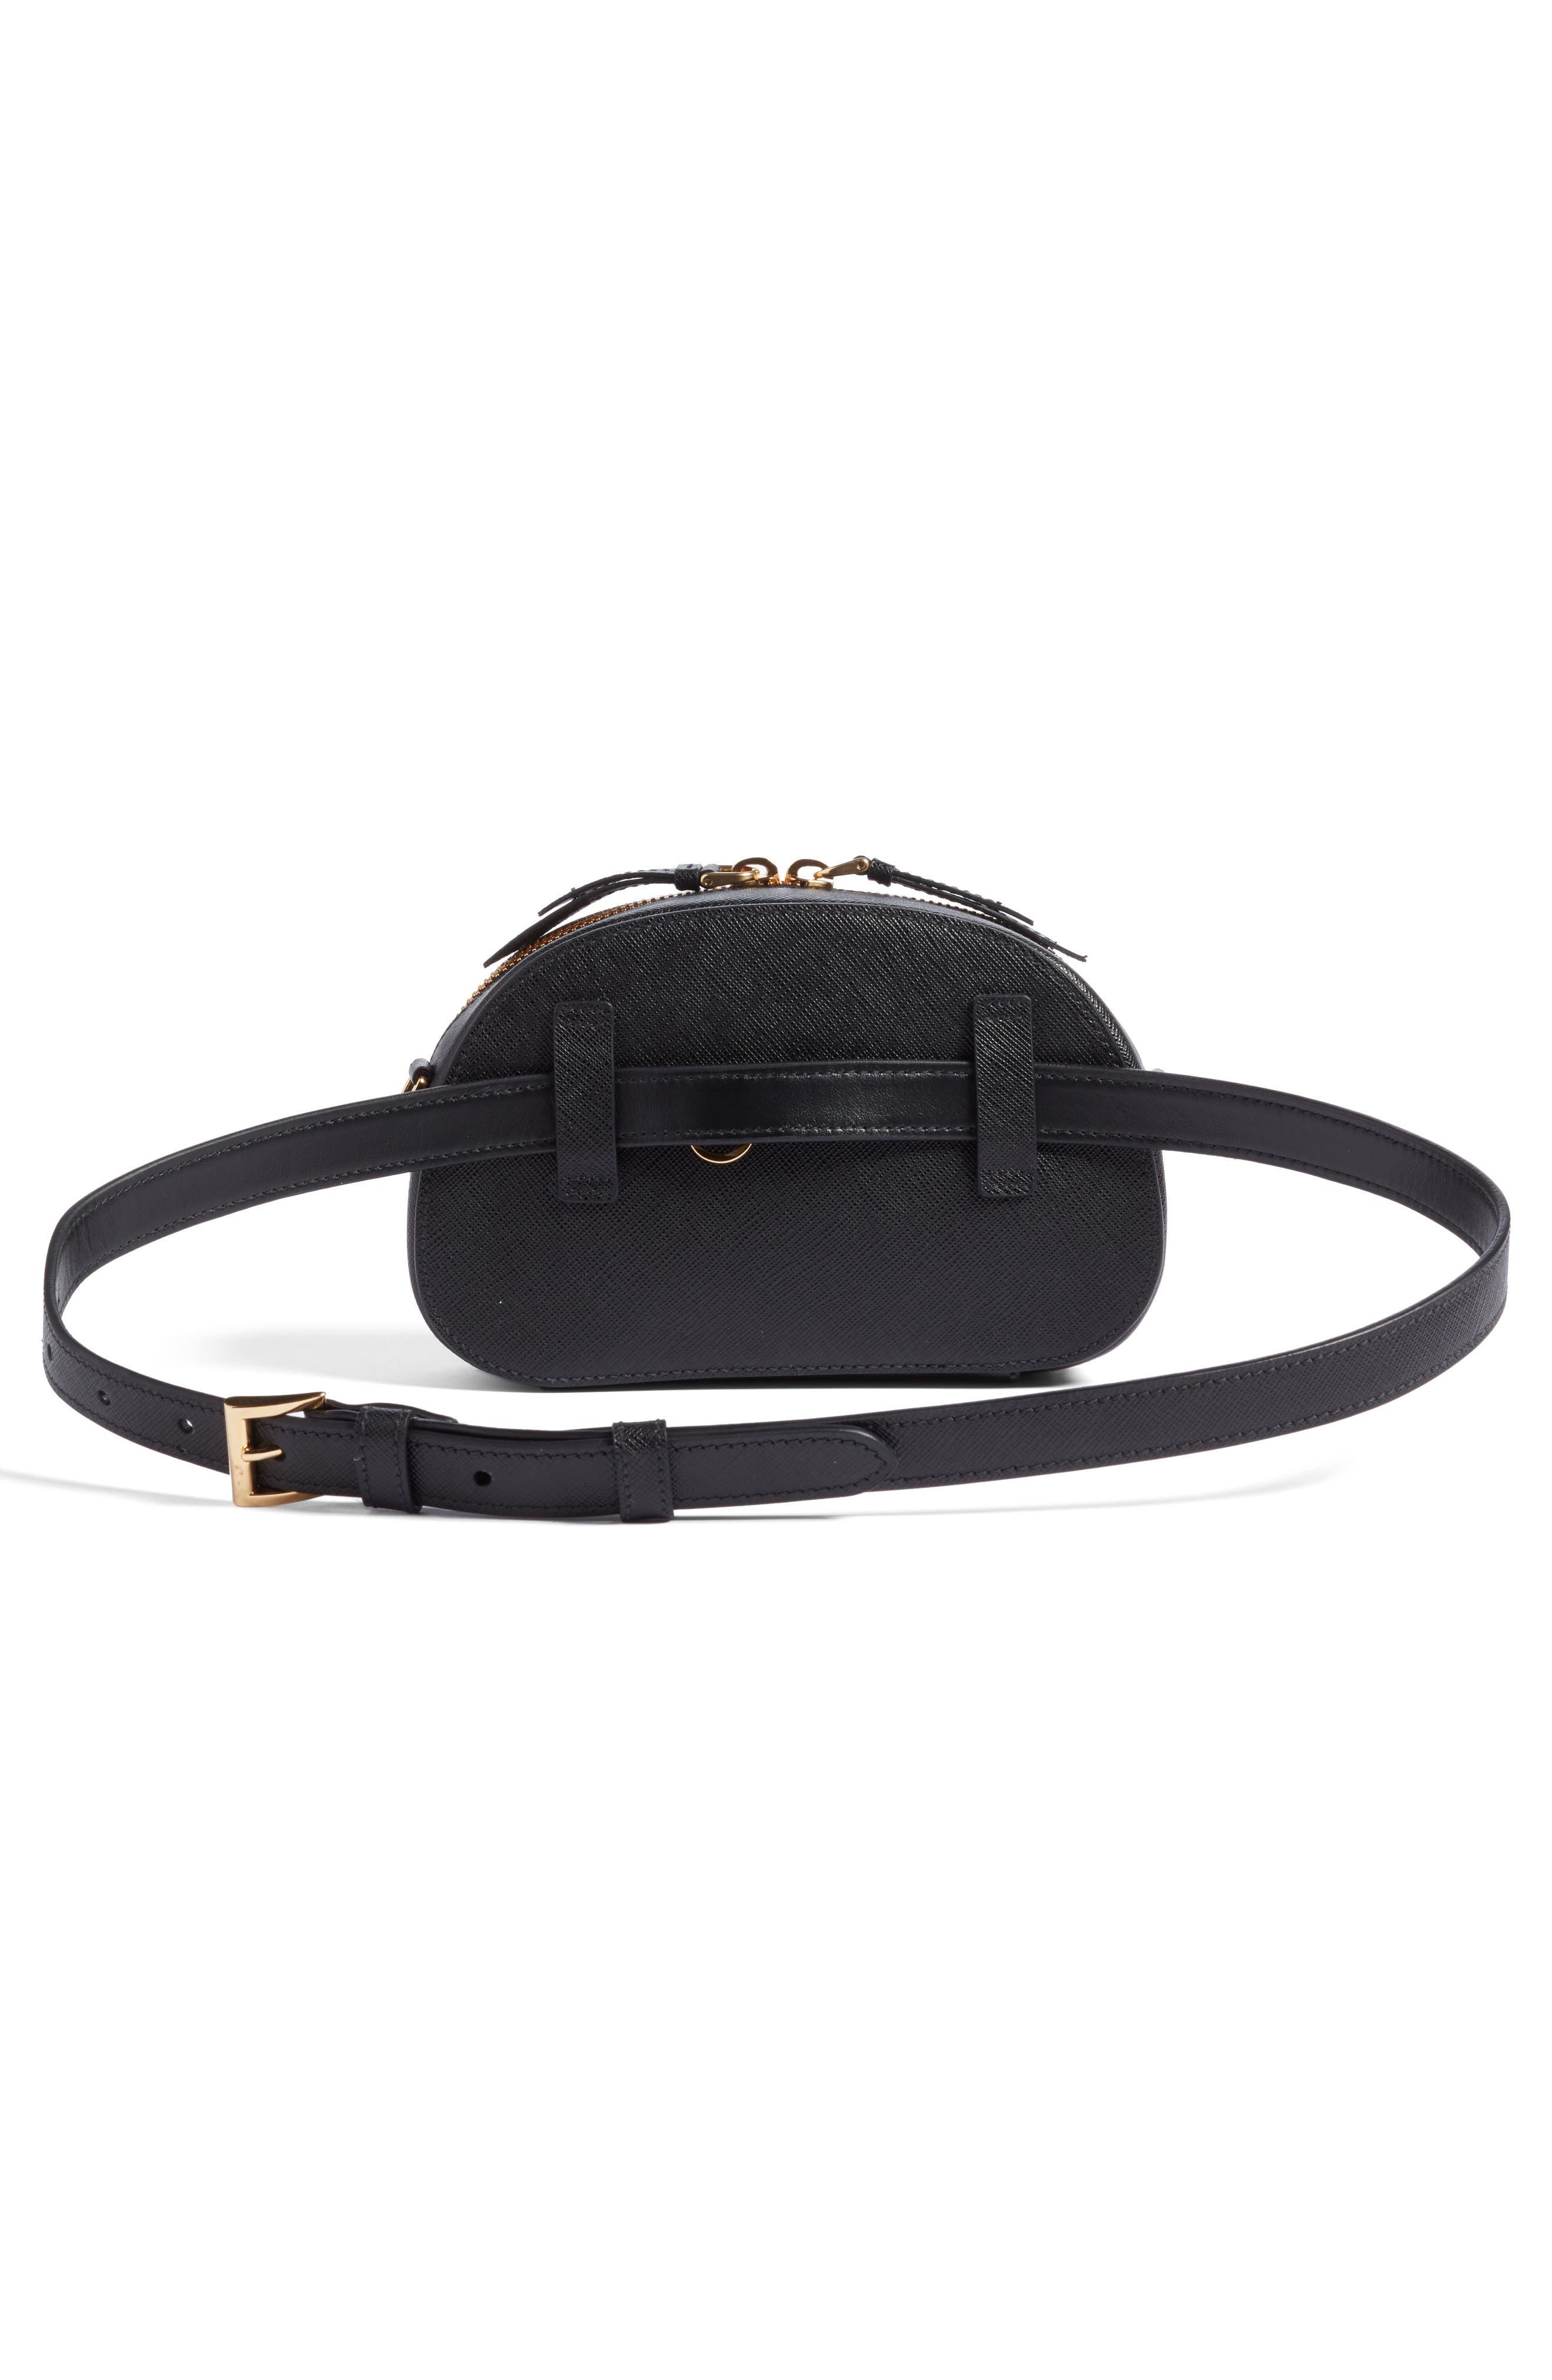 PRADA, Saffiano Leather Belt Bag, Alternate thumbnail 4, color, 001